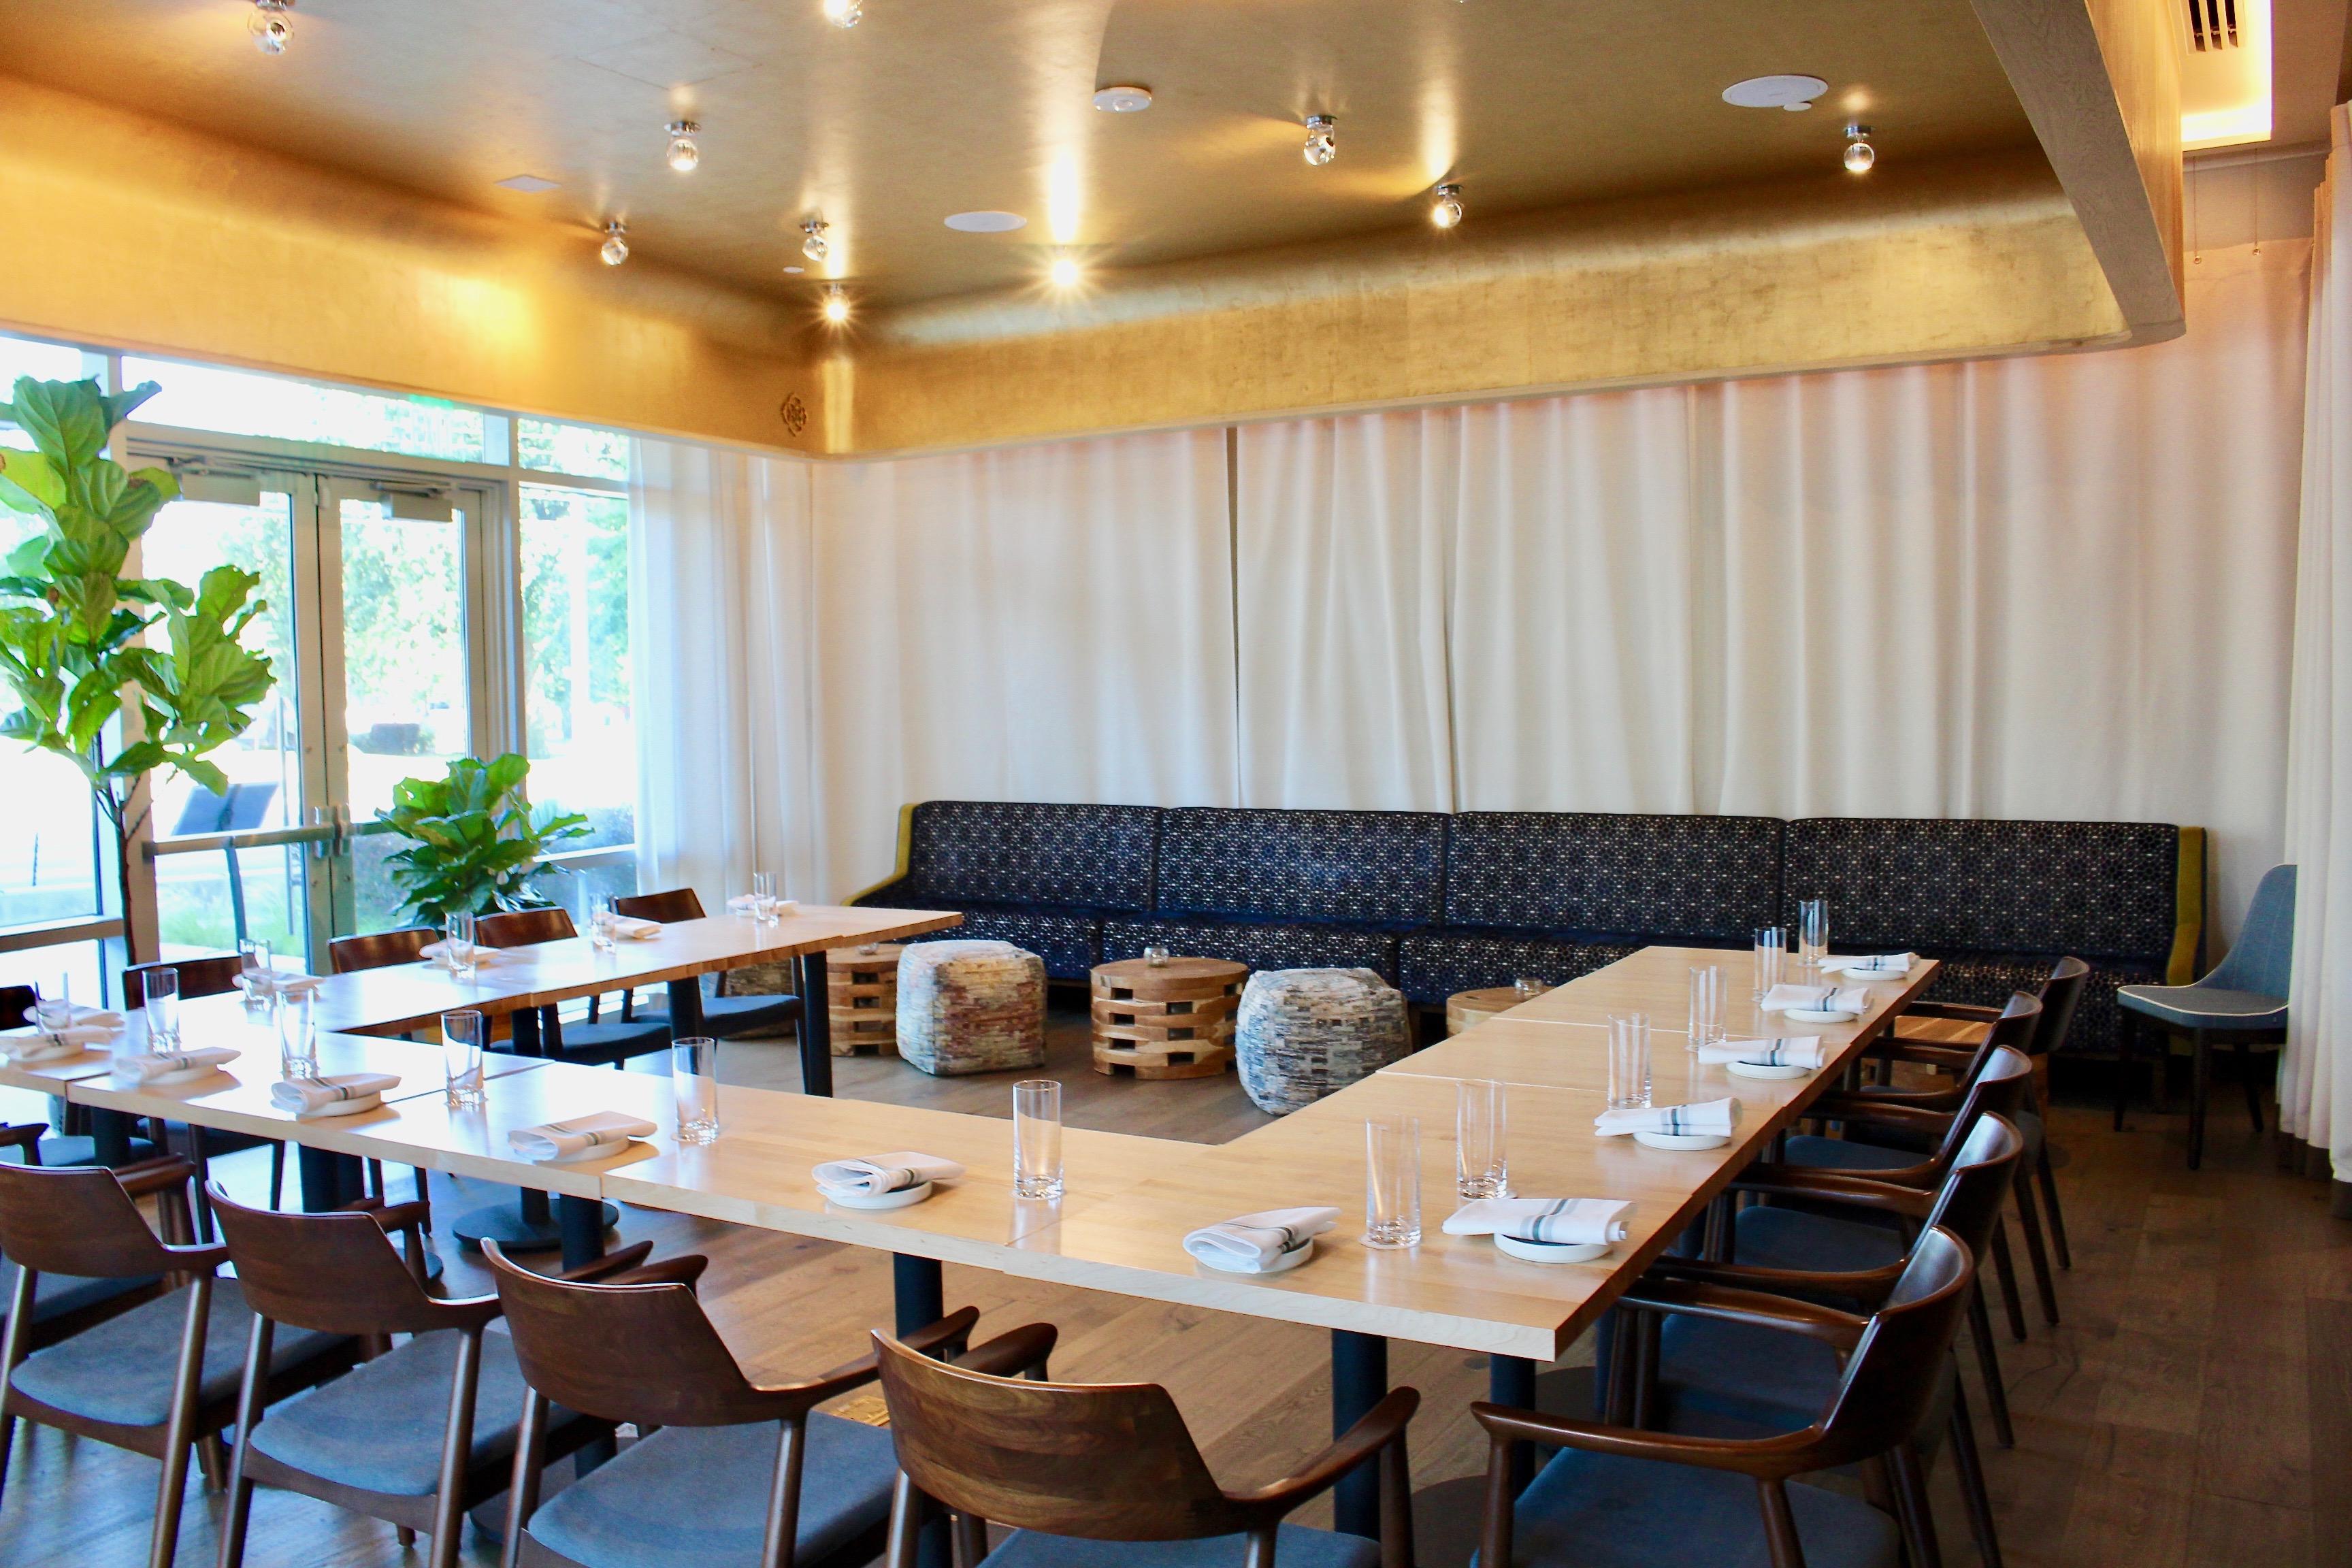 Best Private Dining Rooms in Austin Restaurants - Eater Austin